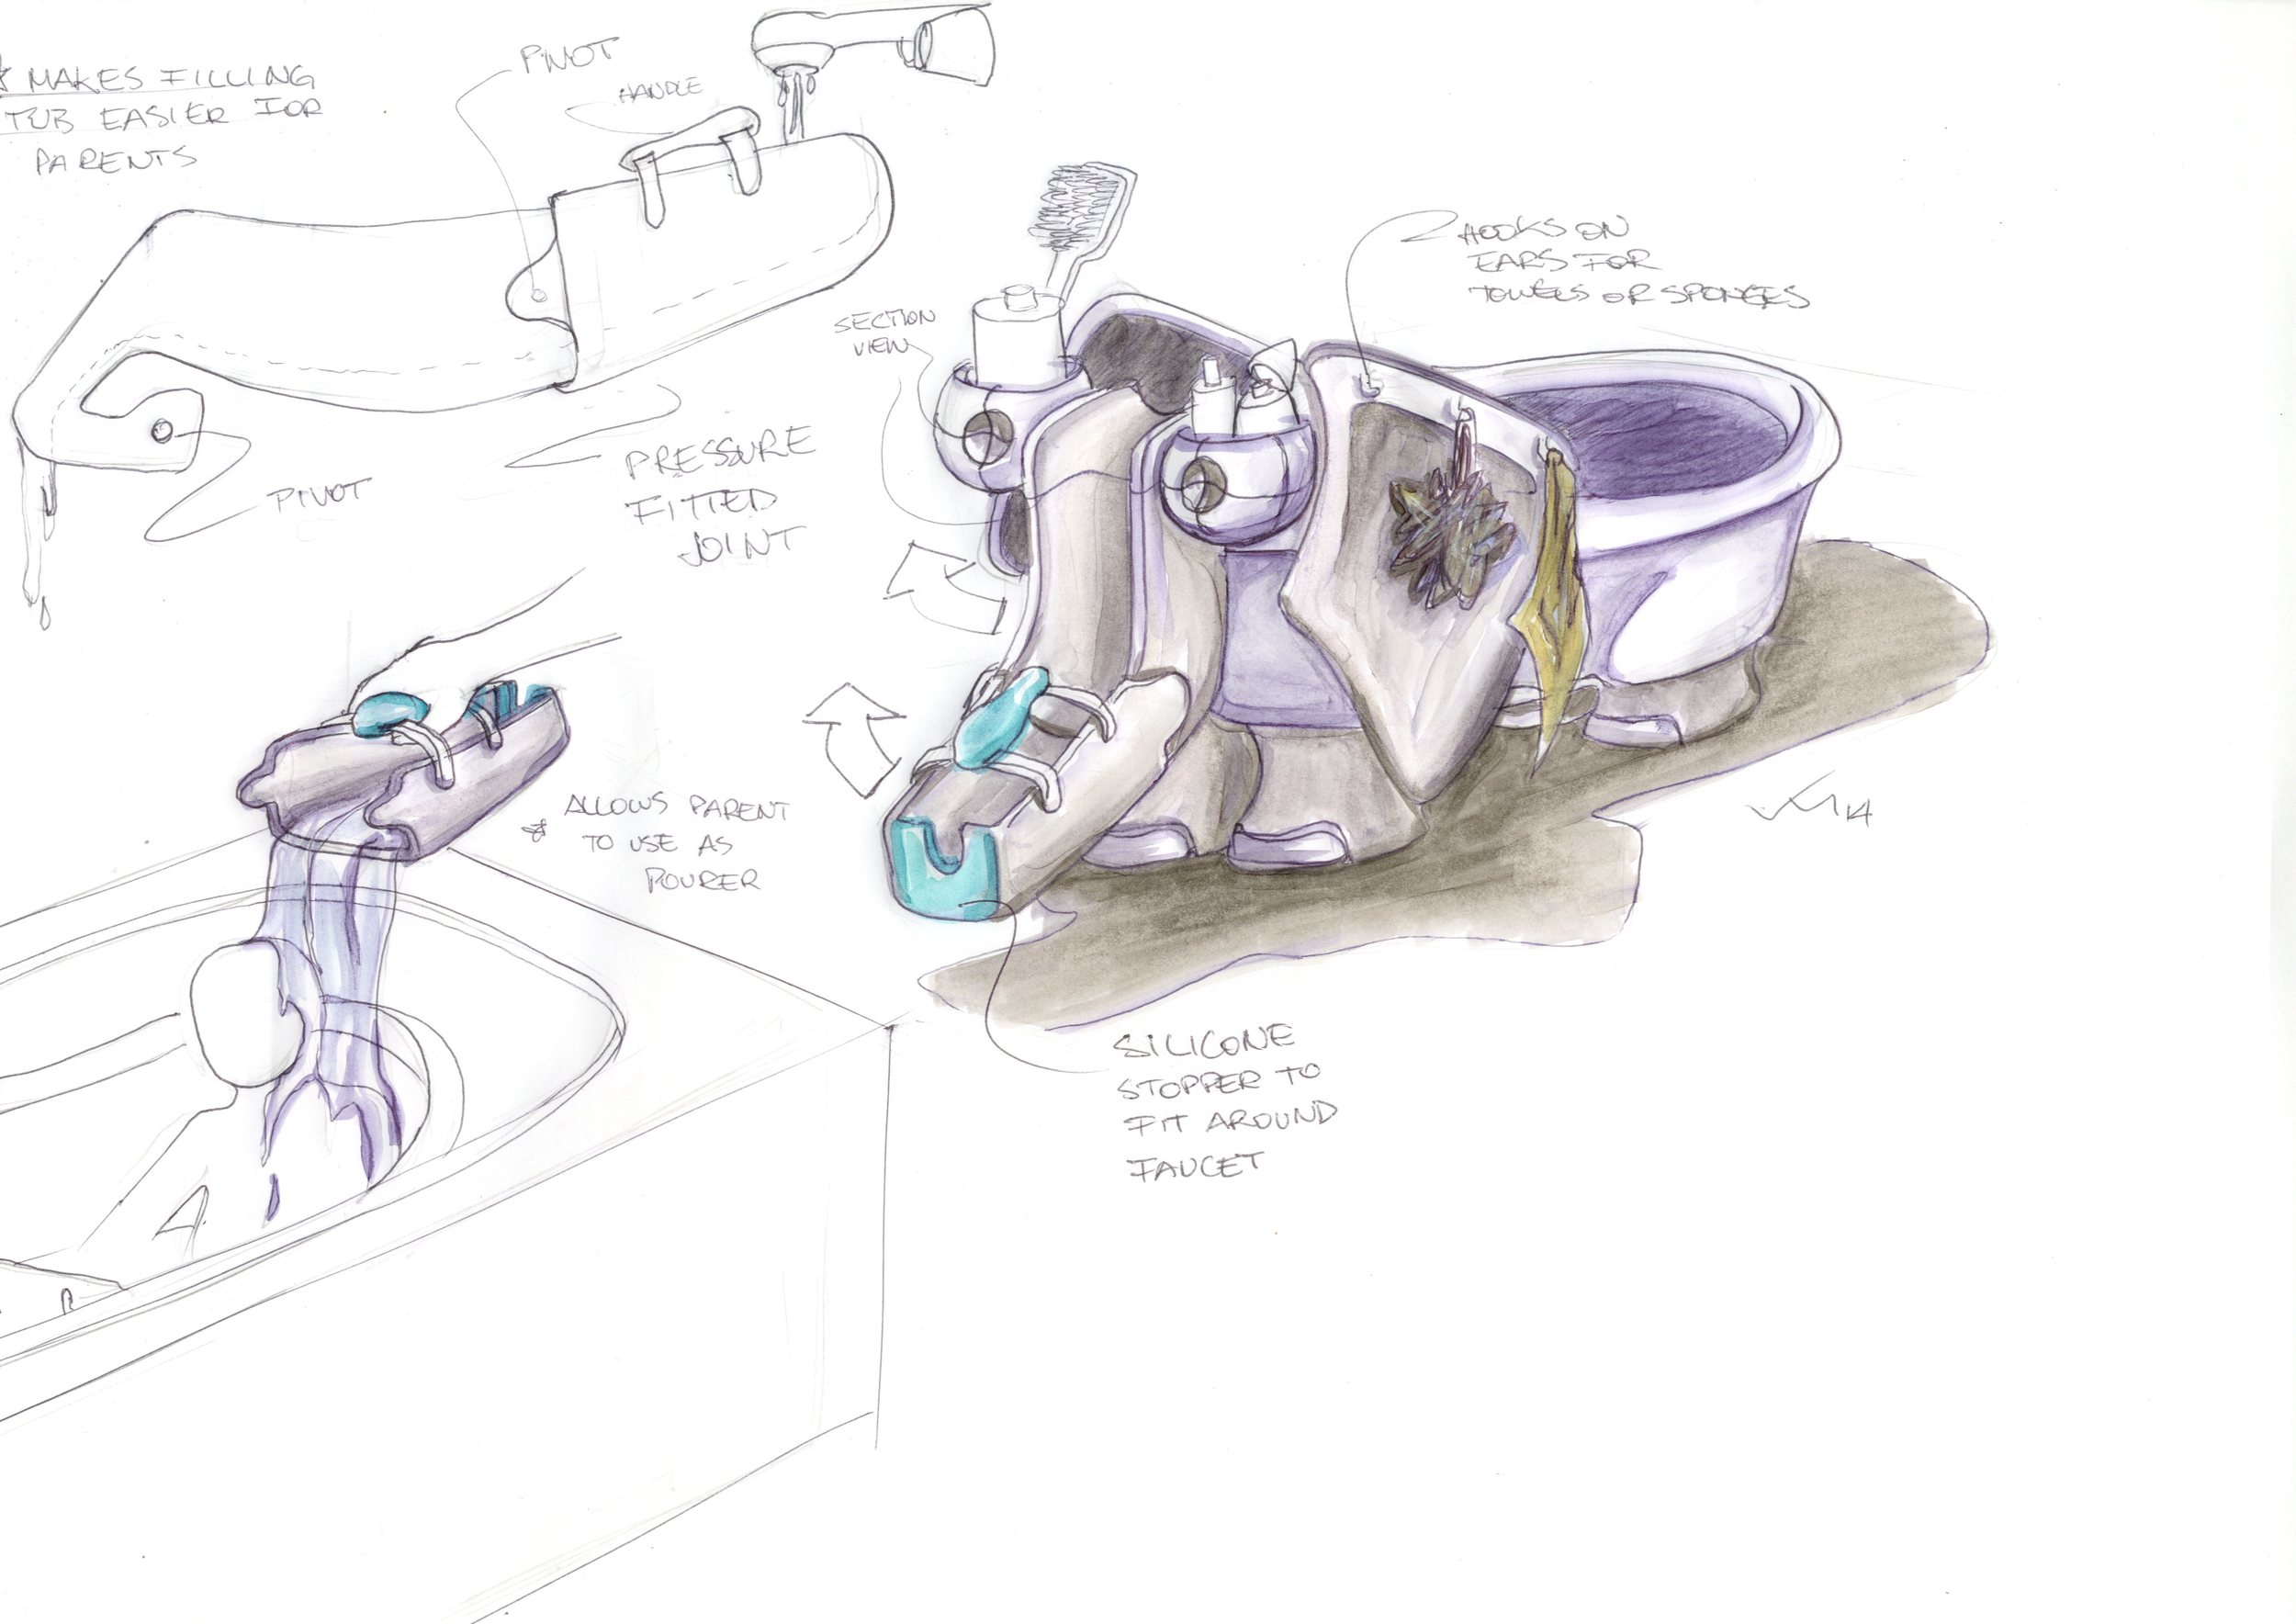 Elephanttub-sketches.jpg